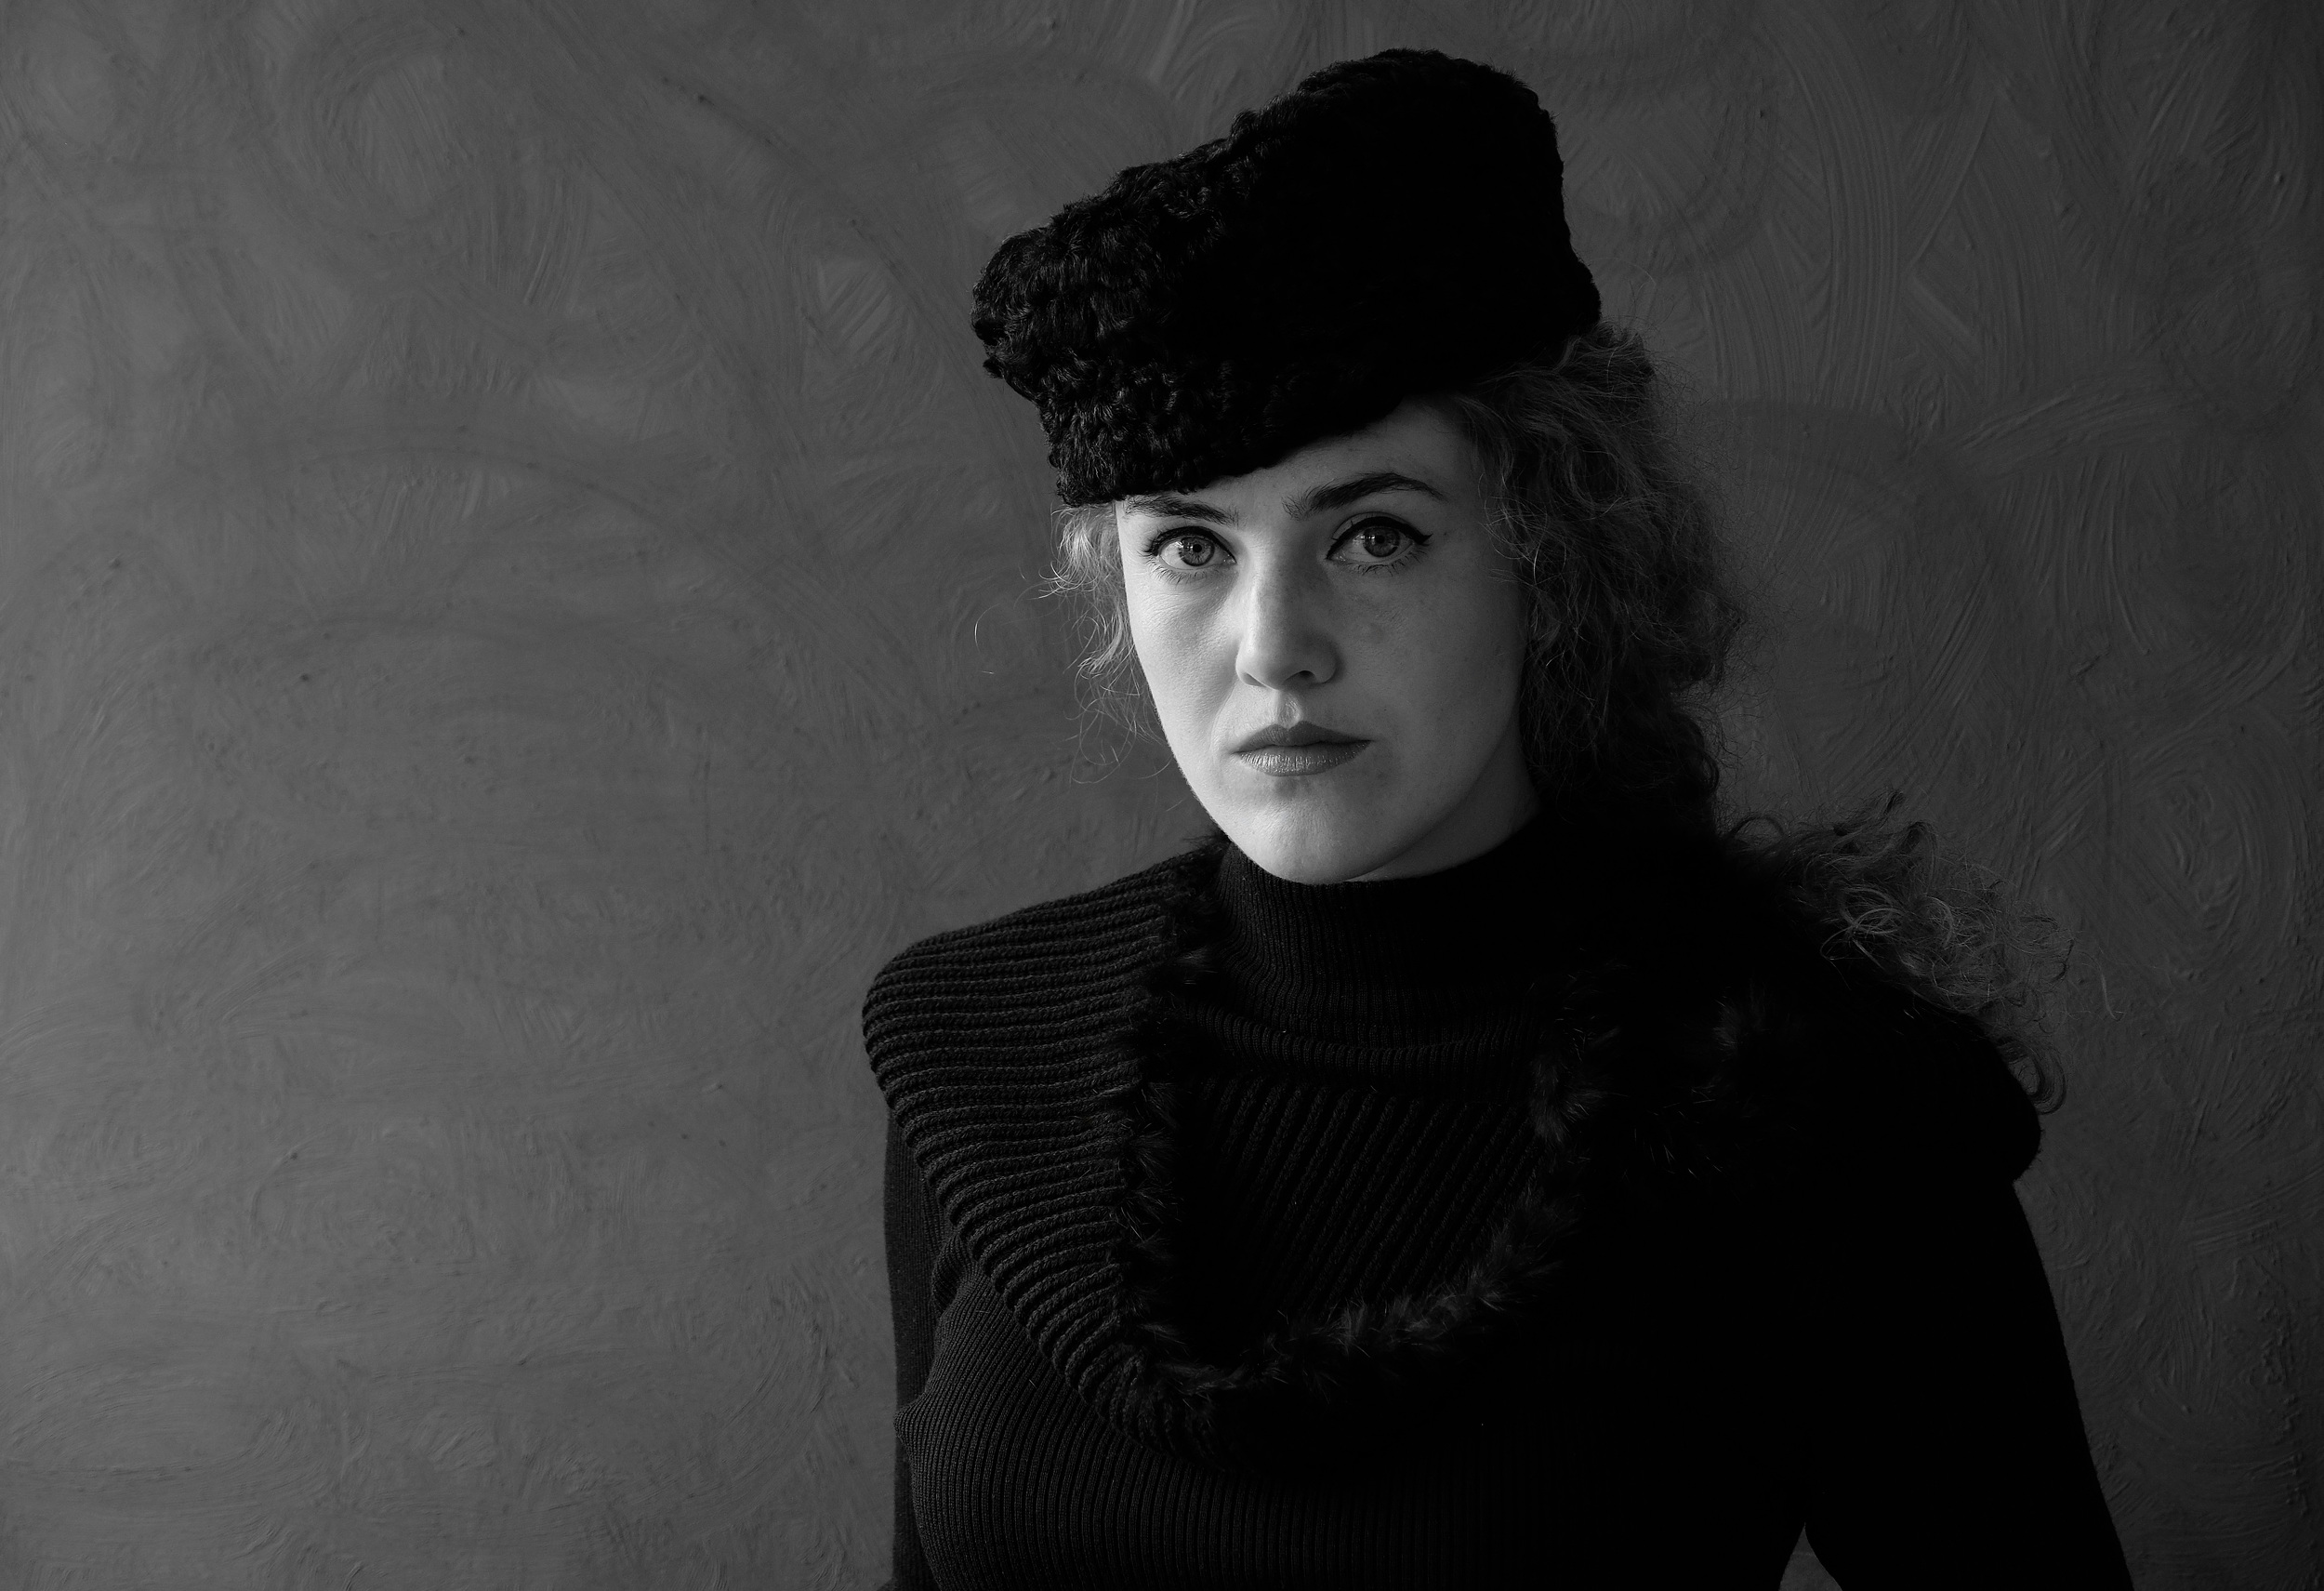 Portrait, female, woman, young, Black & white, hat, people, Norway, mood portrait, , Povarova Ree Svetlana